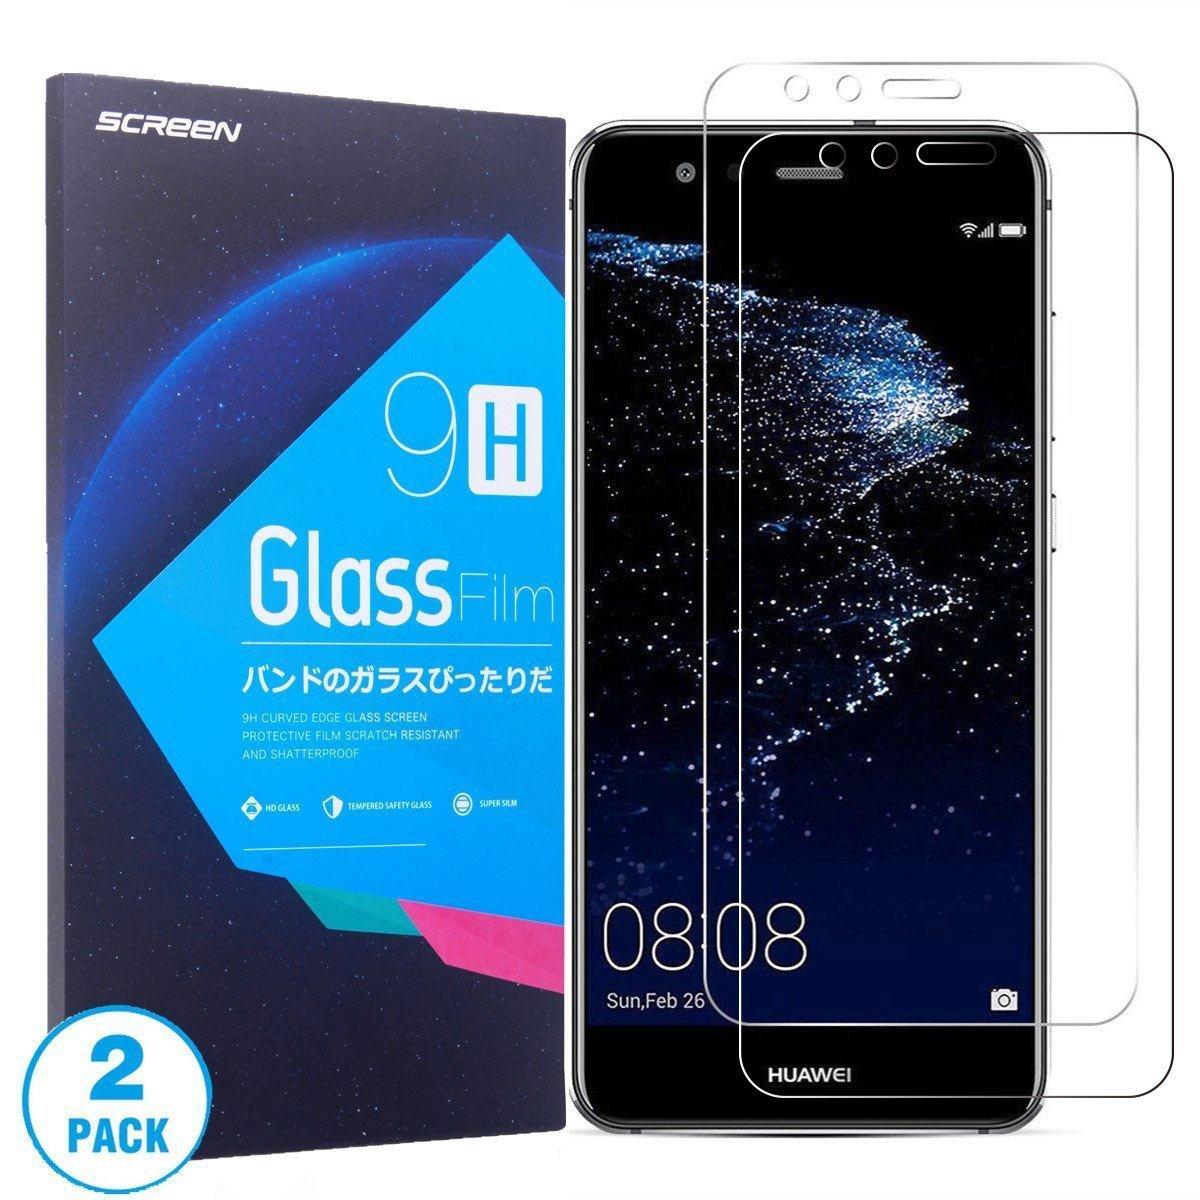 Huawei P10 Lite Protector de pantalla 2.1: Amazon.es: Electrónica